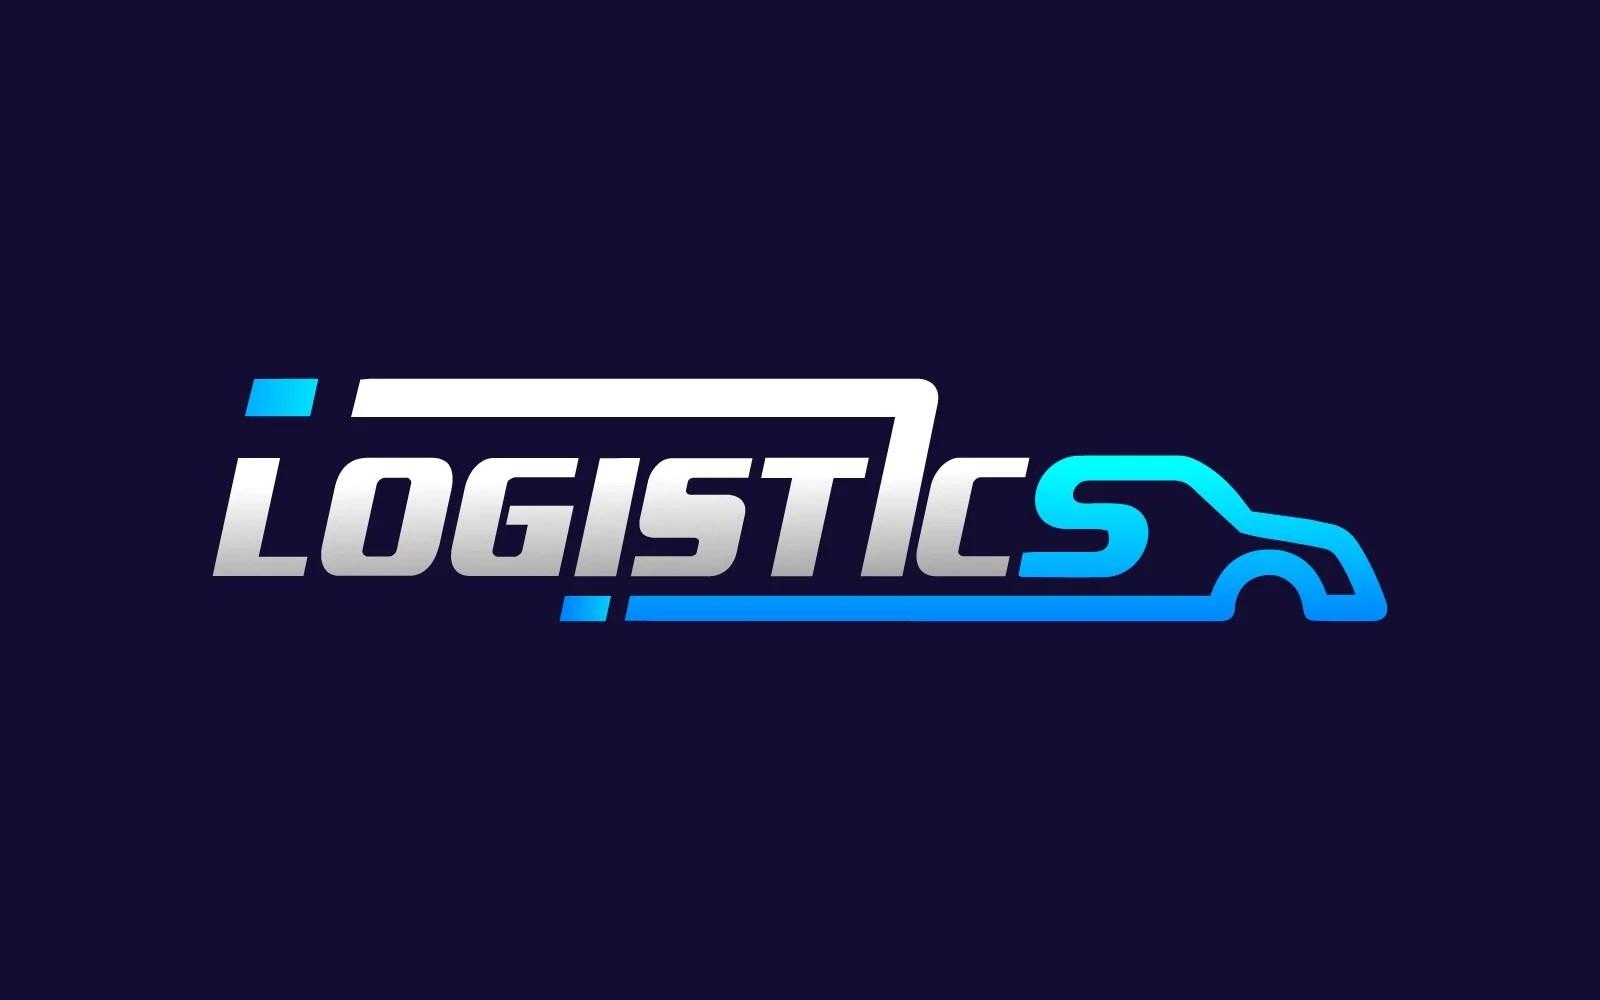 Creative Logistics Auto Truck Transport Logo Design Template